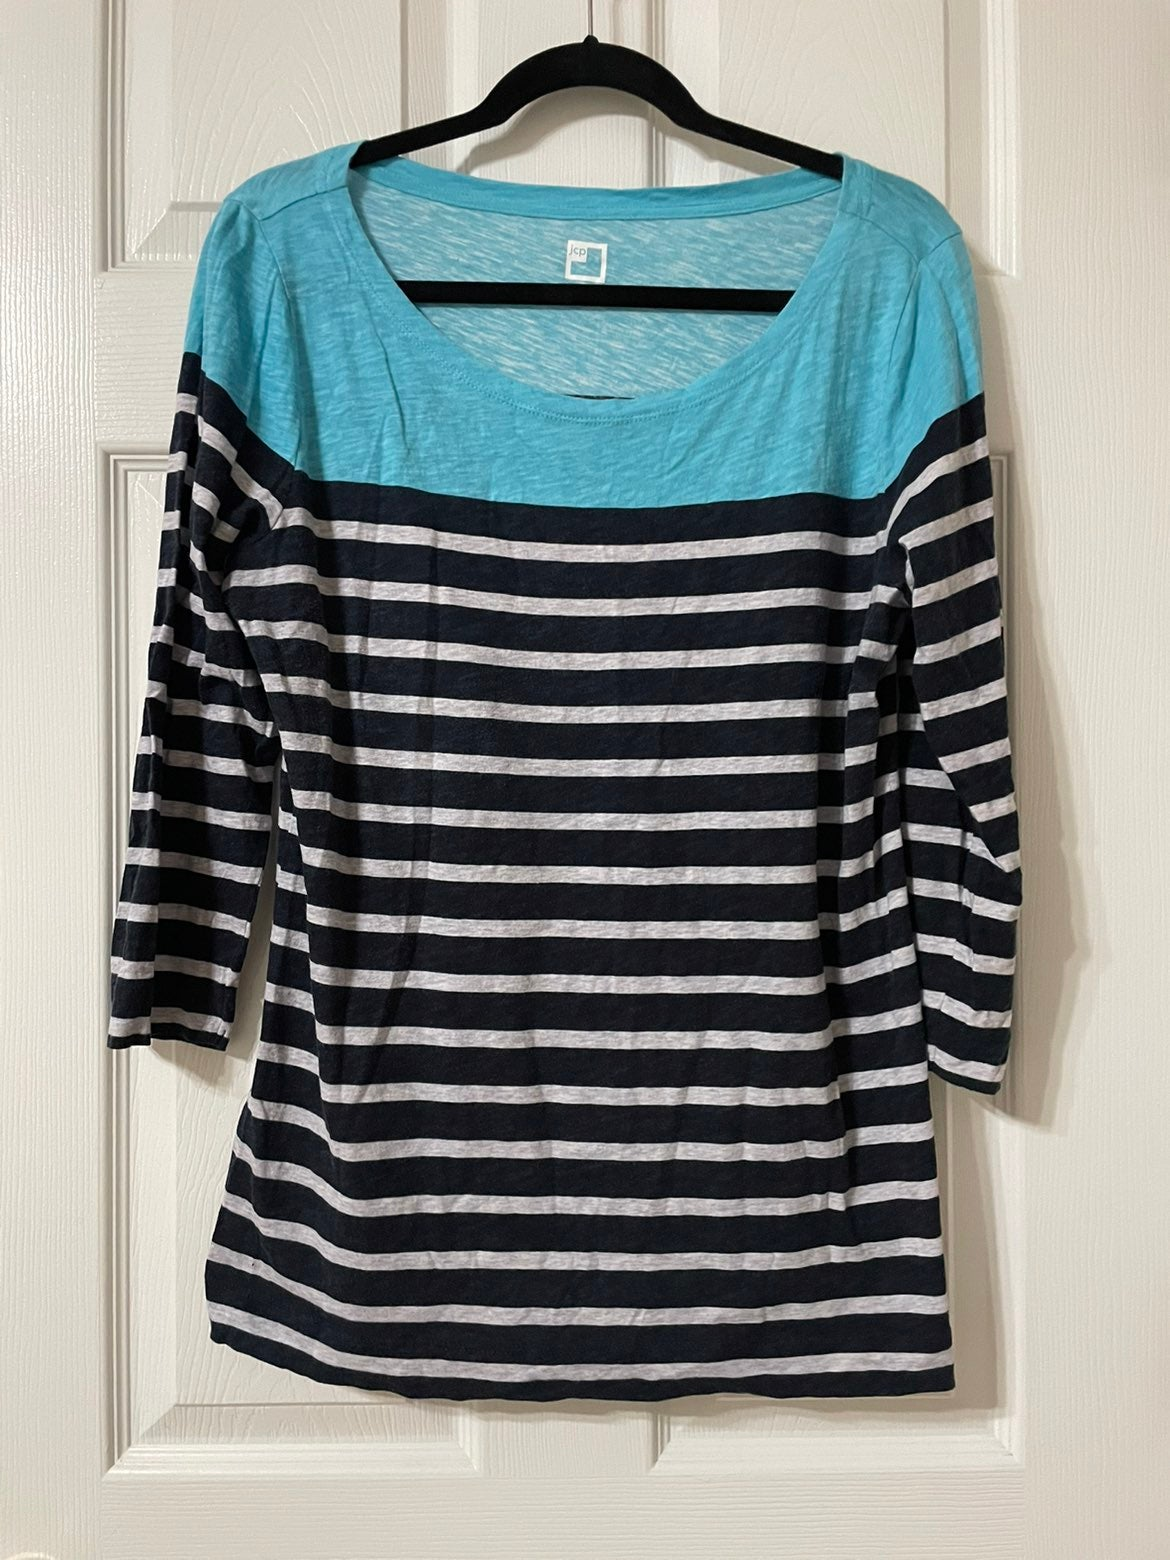 3/4 length sleeve striped blouse